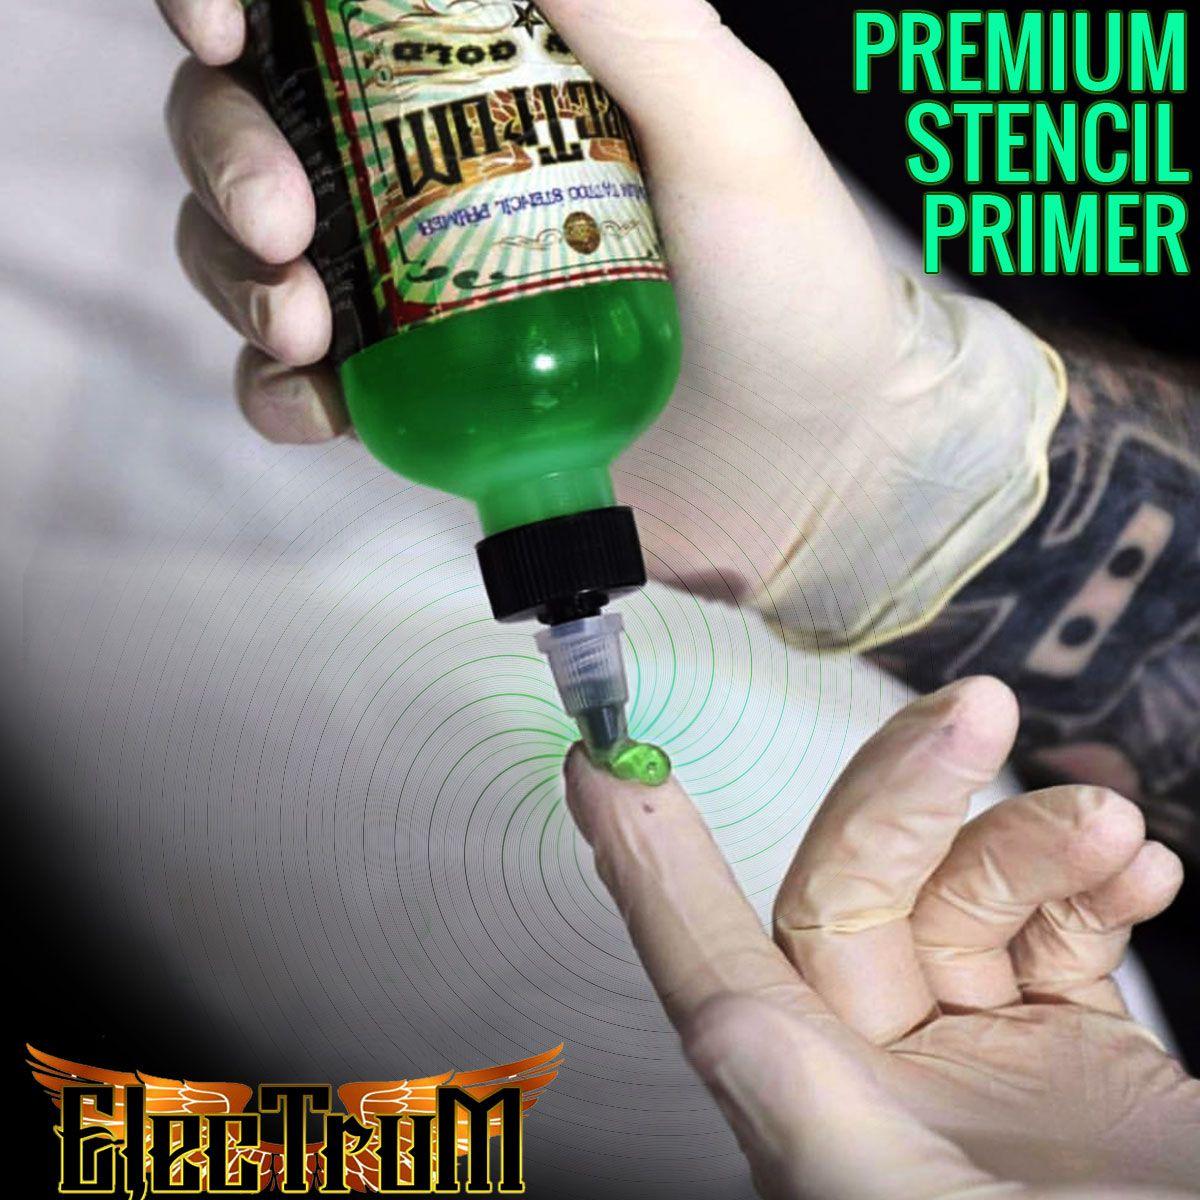 Electrum Tattoo Stencil Primer 8 Oz